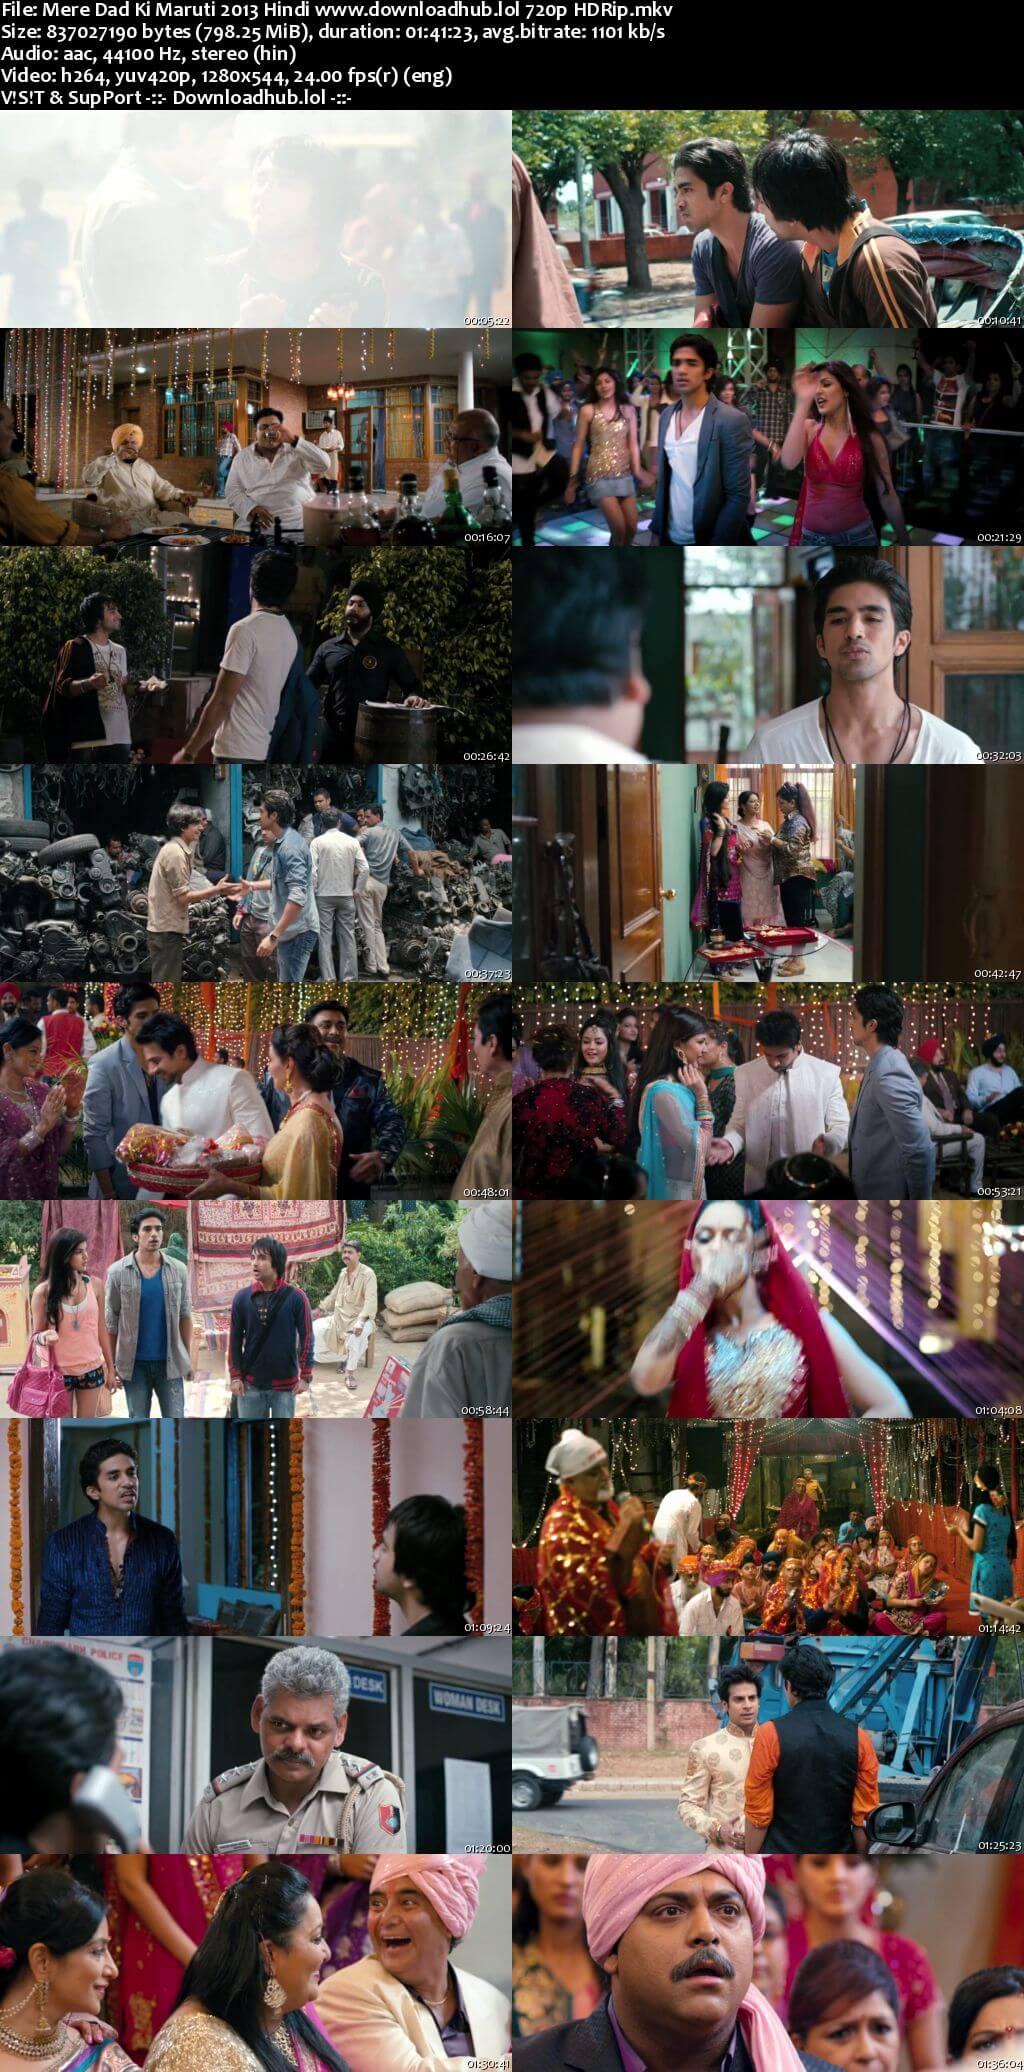 Mere Dad Ki Maruti 2013 Hindi 720p HDRip x264